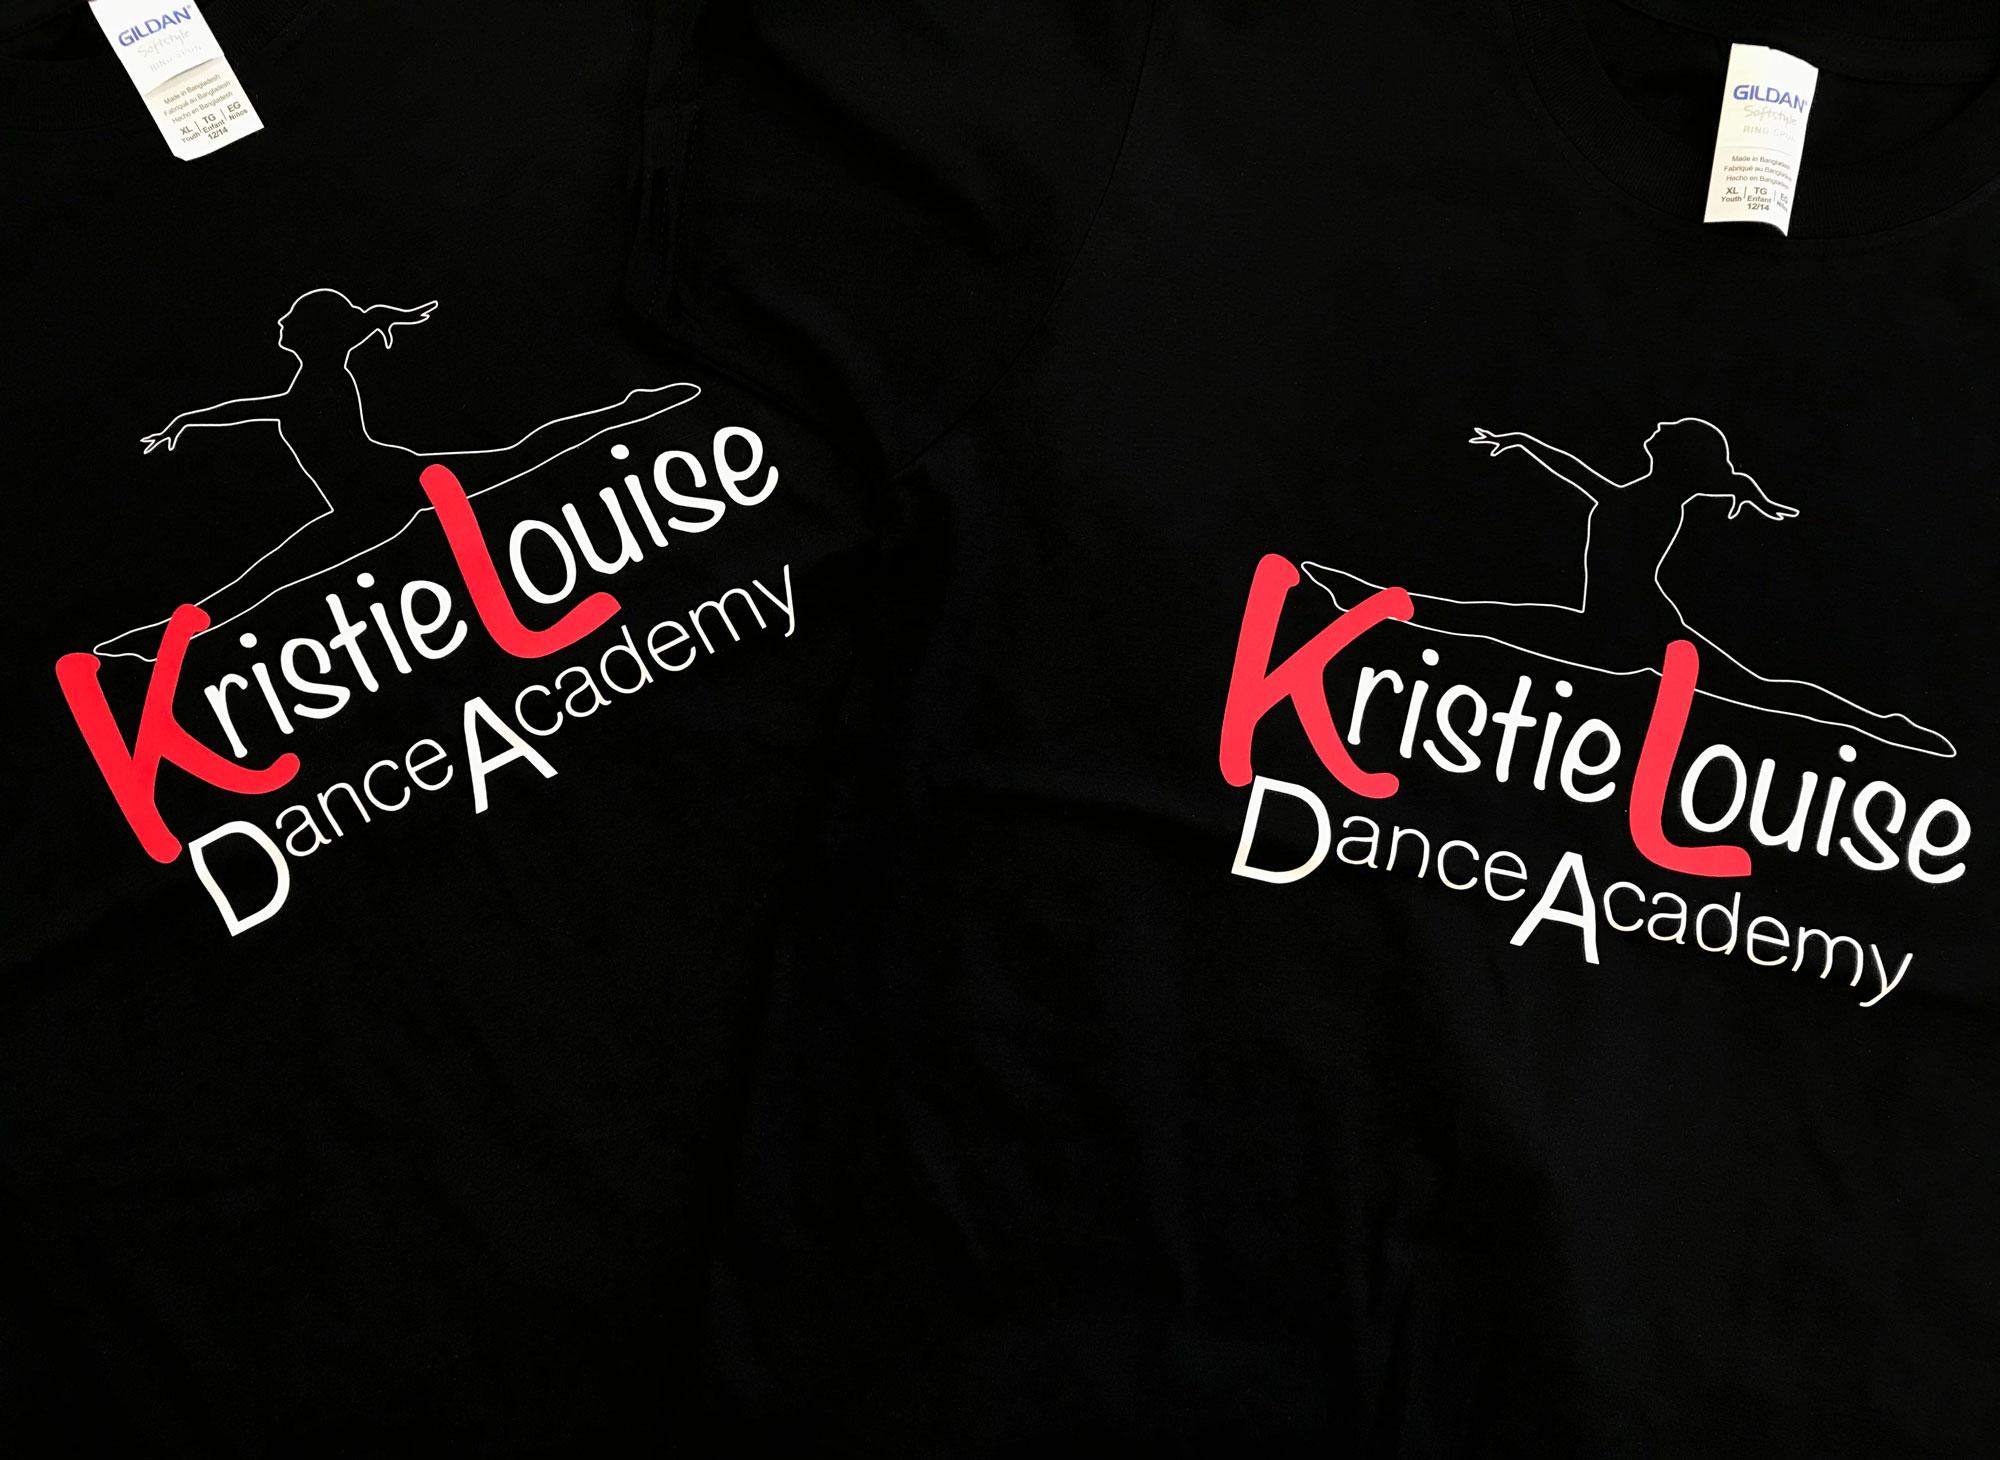 Kristie-Louise-WEB-SMALL.jpg